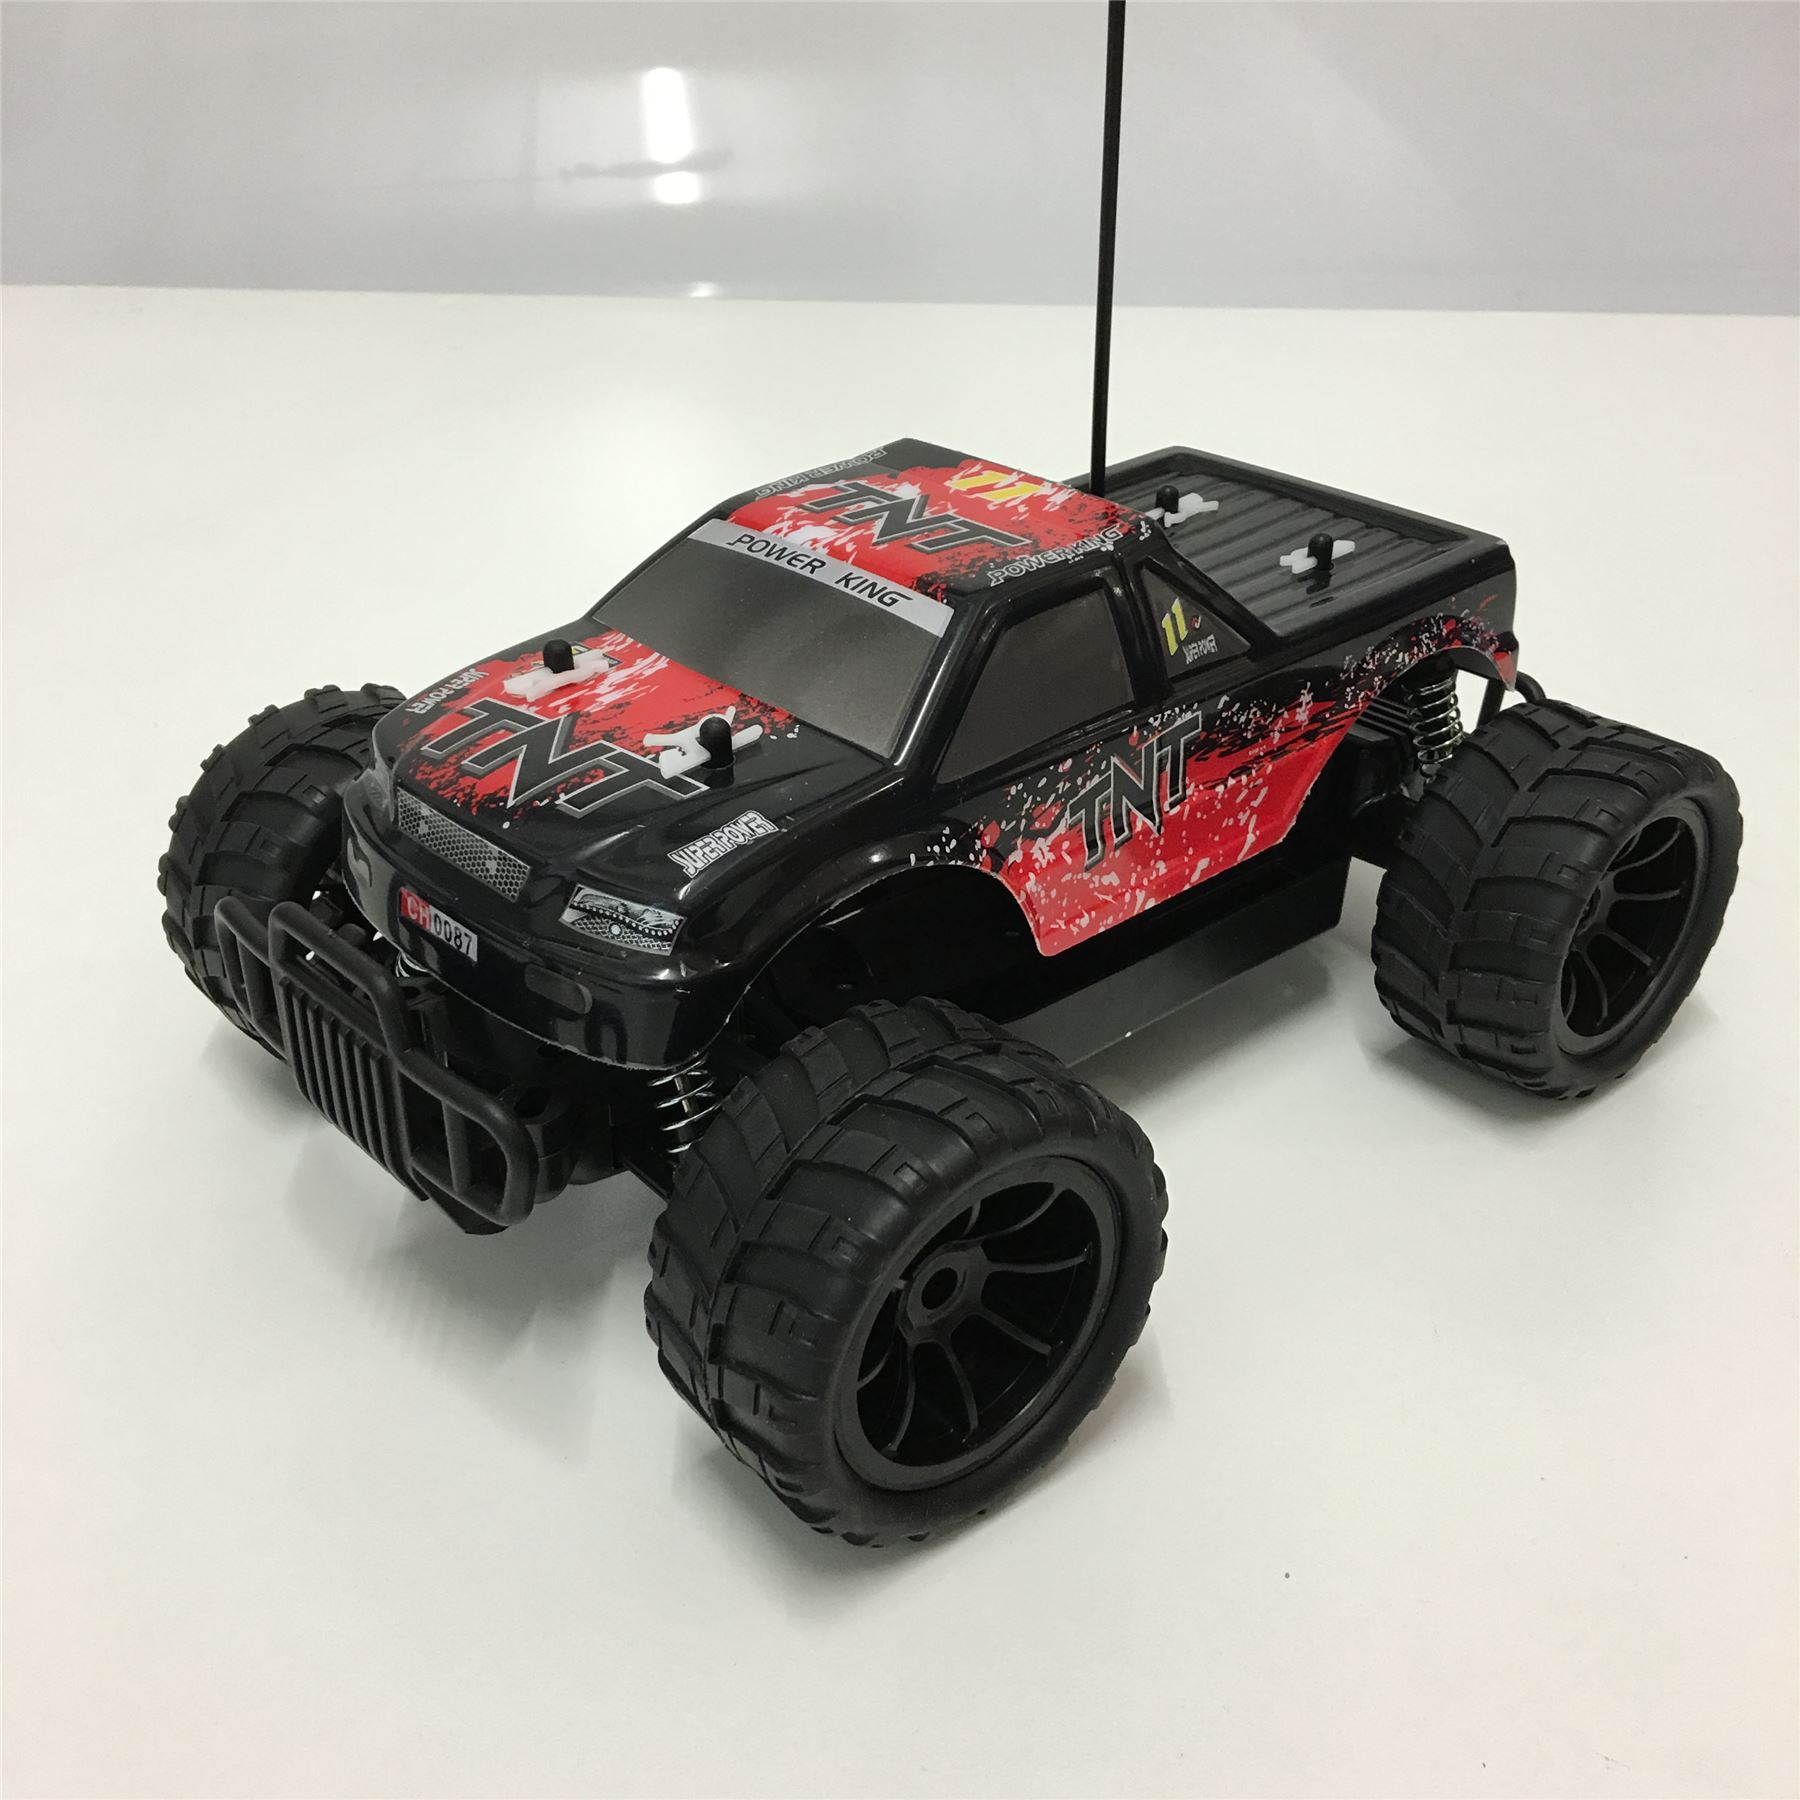 1 16 radio t l commande voiture rc buggy tout terrain monster truck d riveur ebay. Black Bedroom Furniture Sets. Home Design Ideas